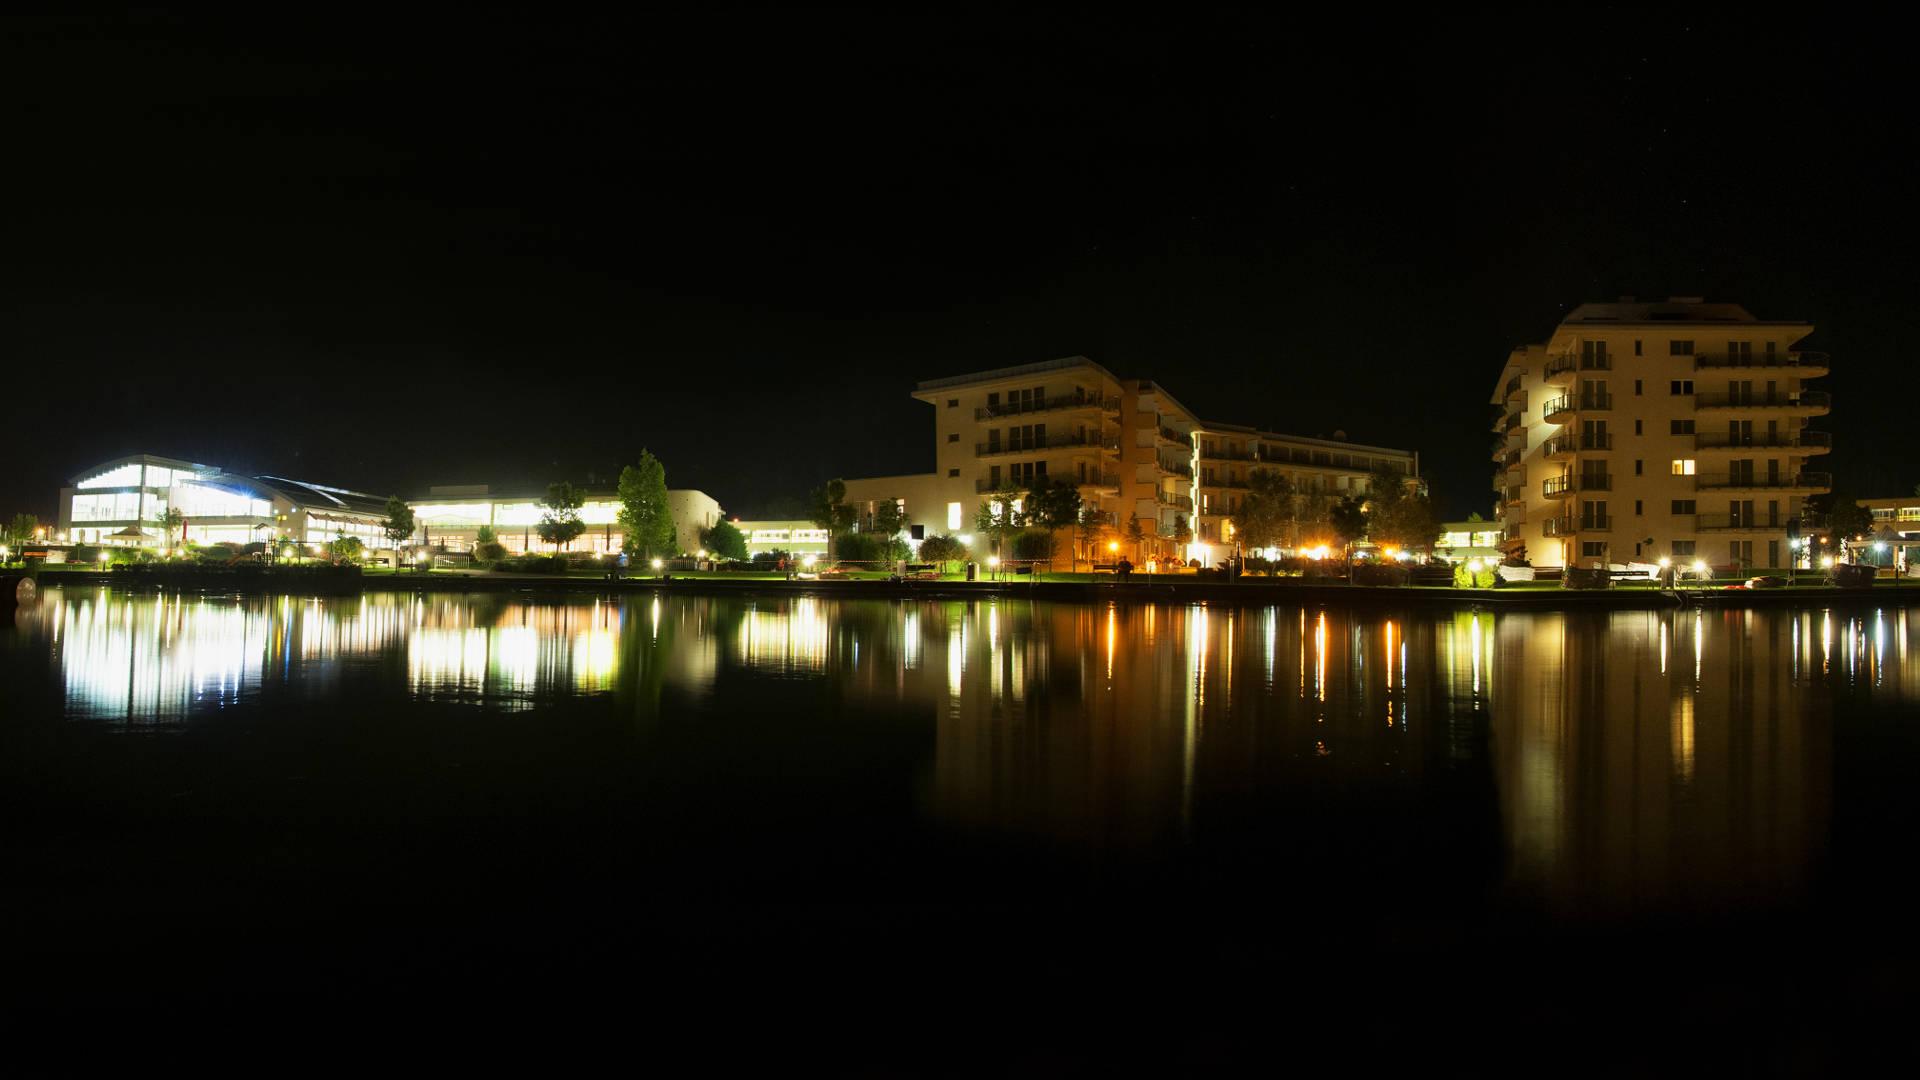 Velence Resort & Spa - Éjjeli panorámafotó